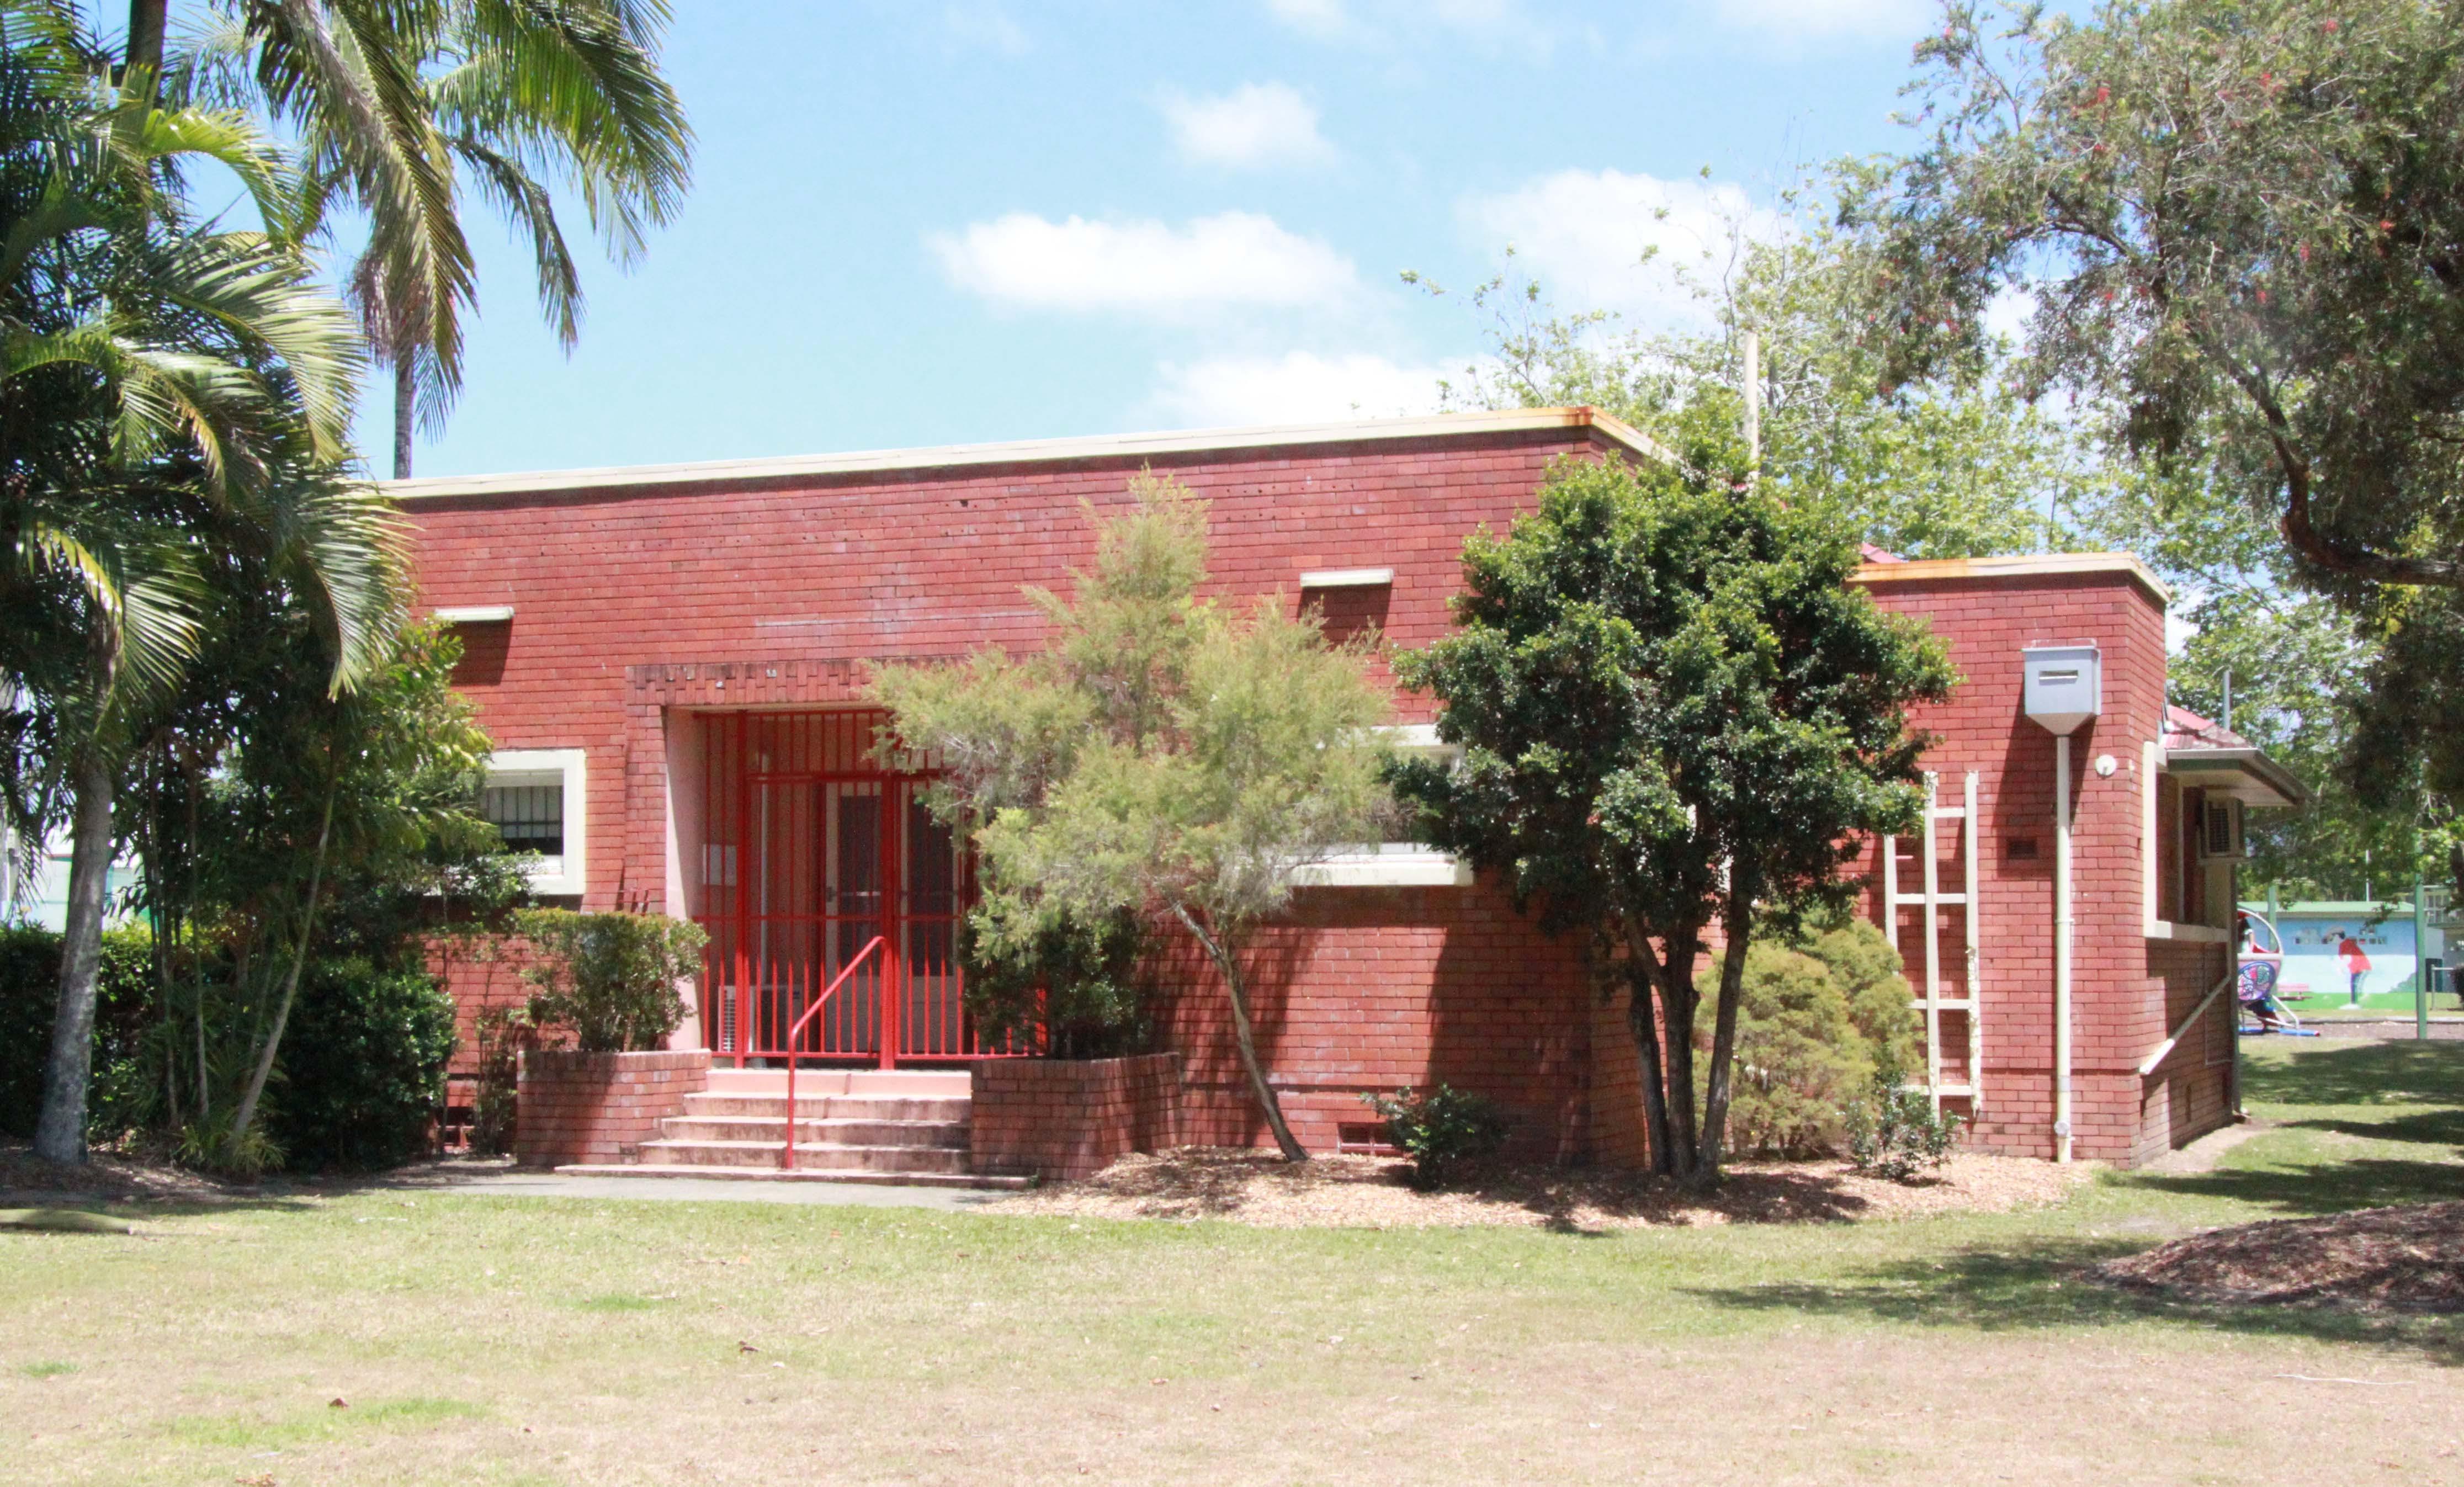 The CWA building in Brisbane Street.